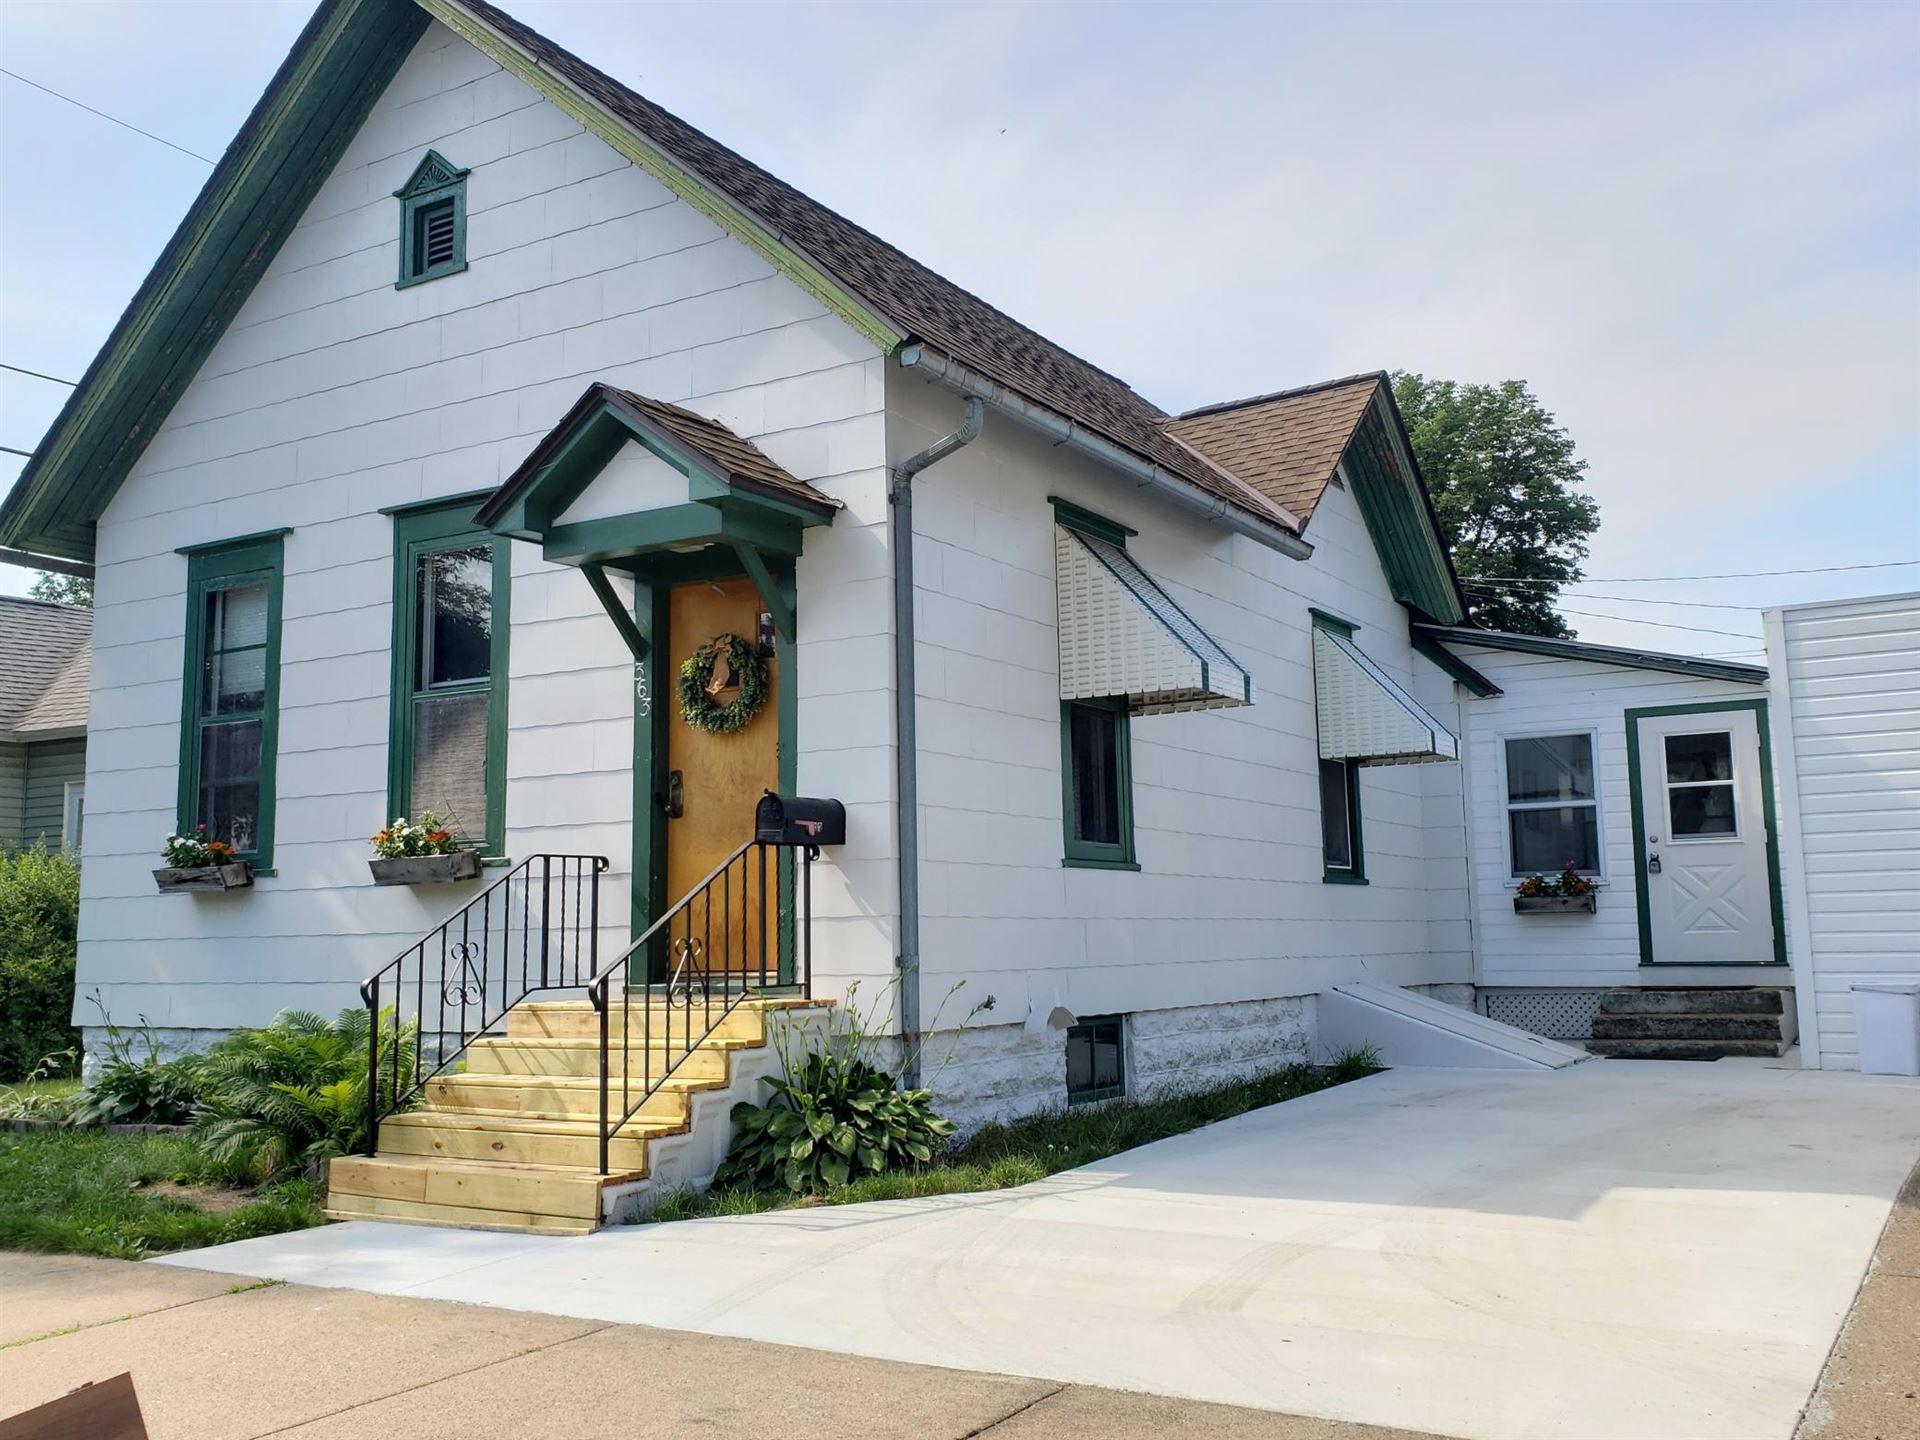 363 W Sarnia Street, Winona, MN 55987 - MLS#: 5618708